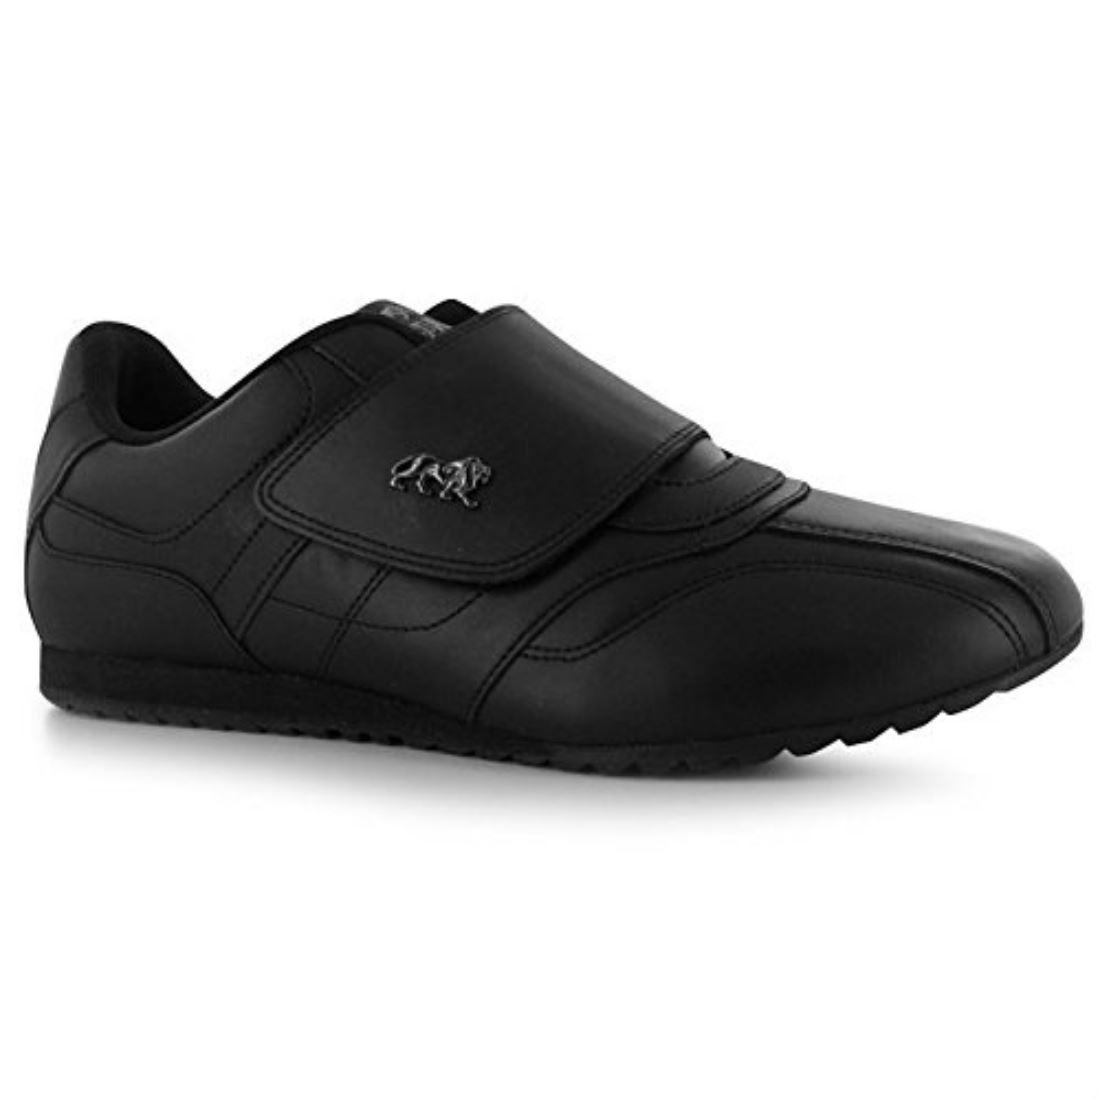 Velcro Shoes Adidas Mens